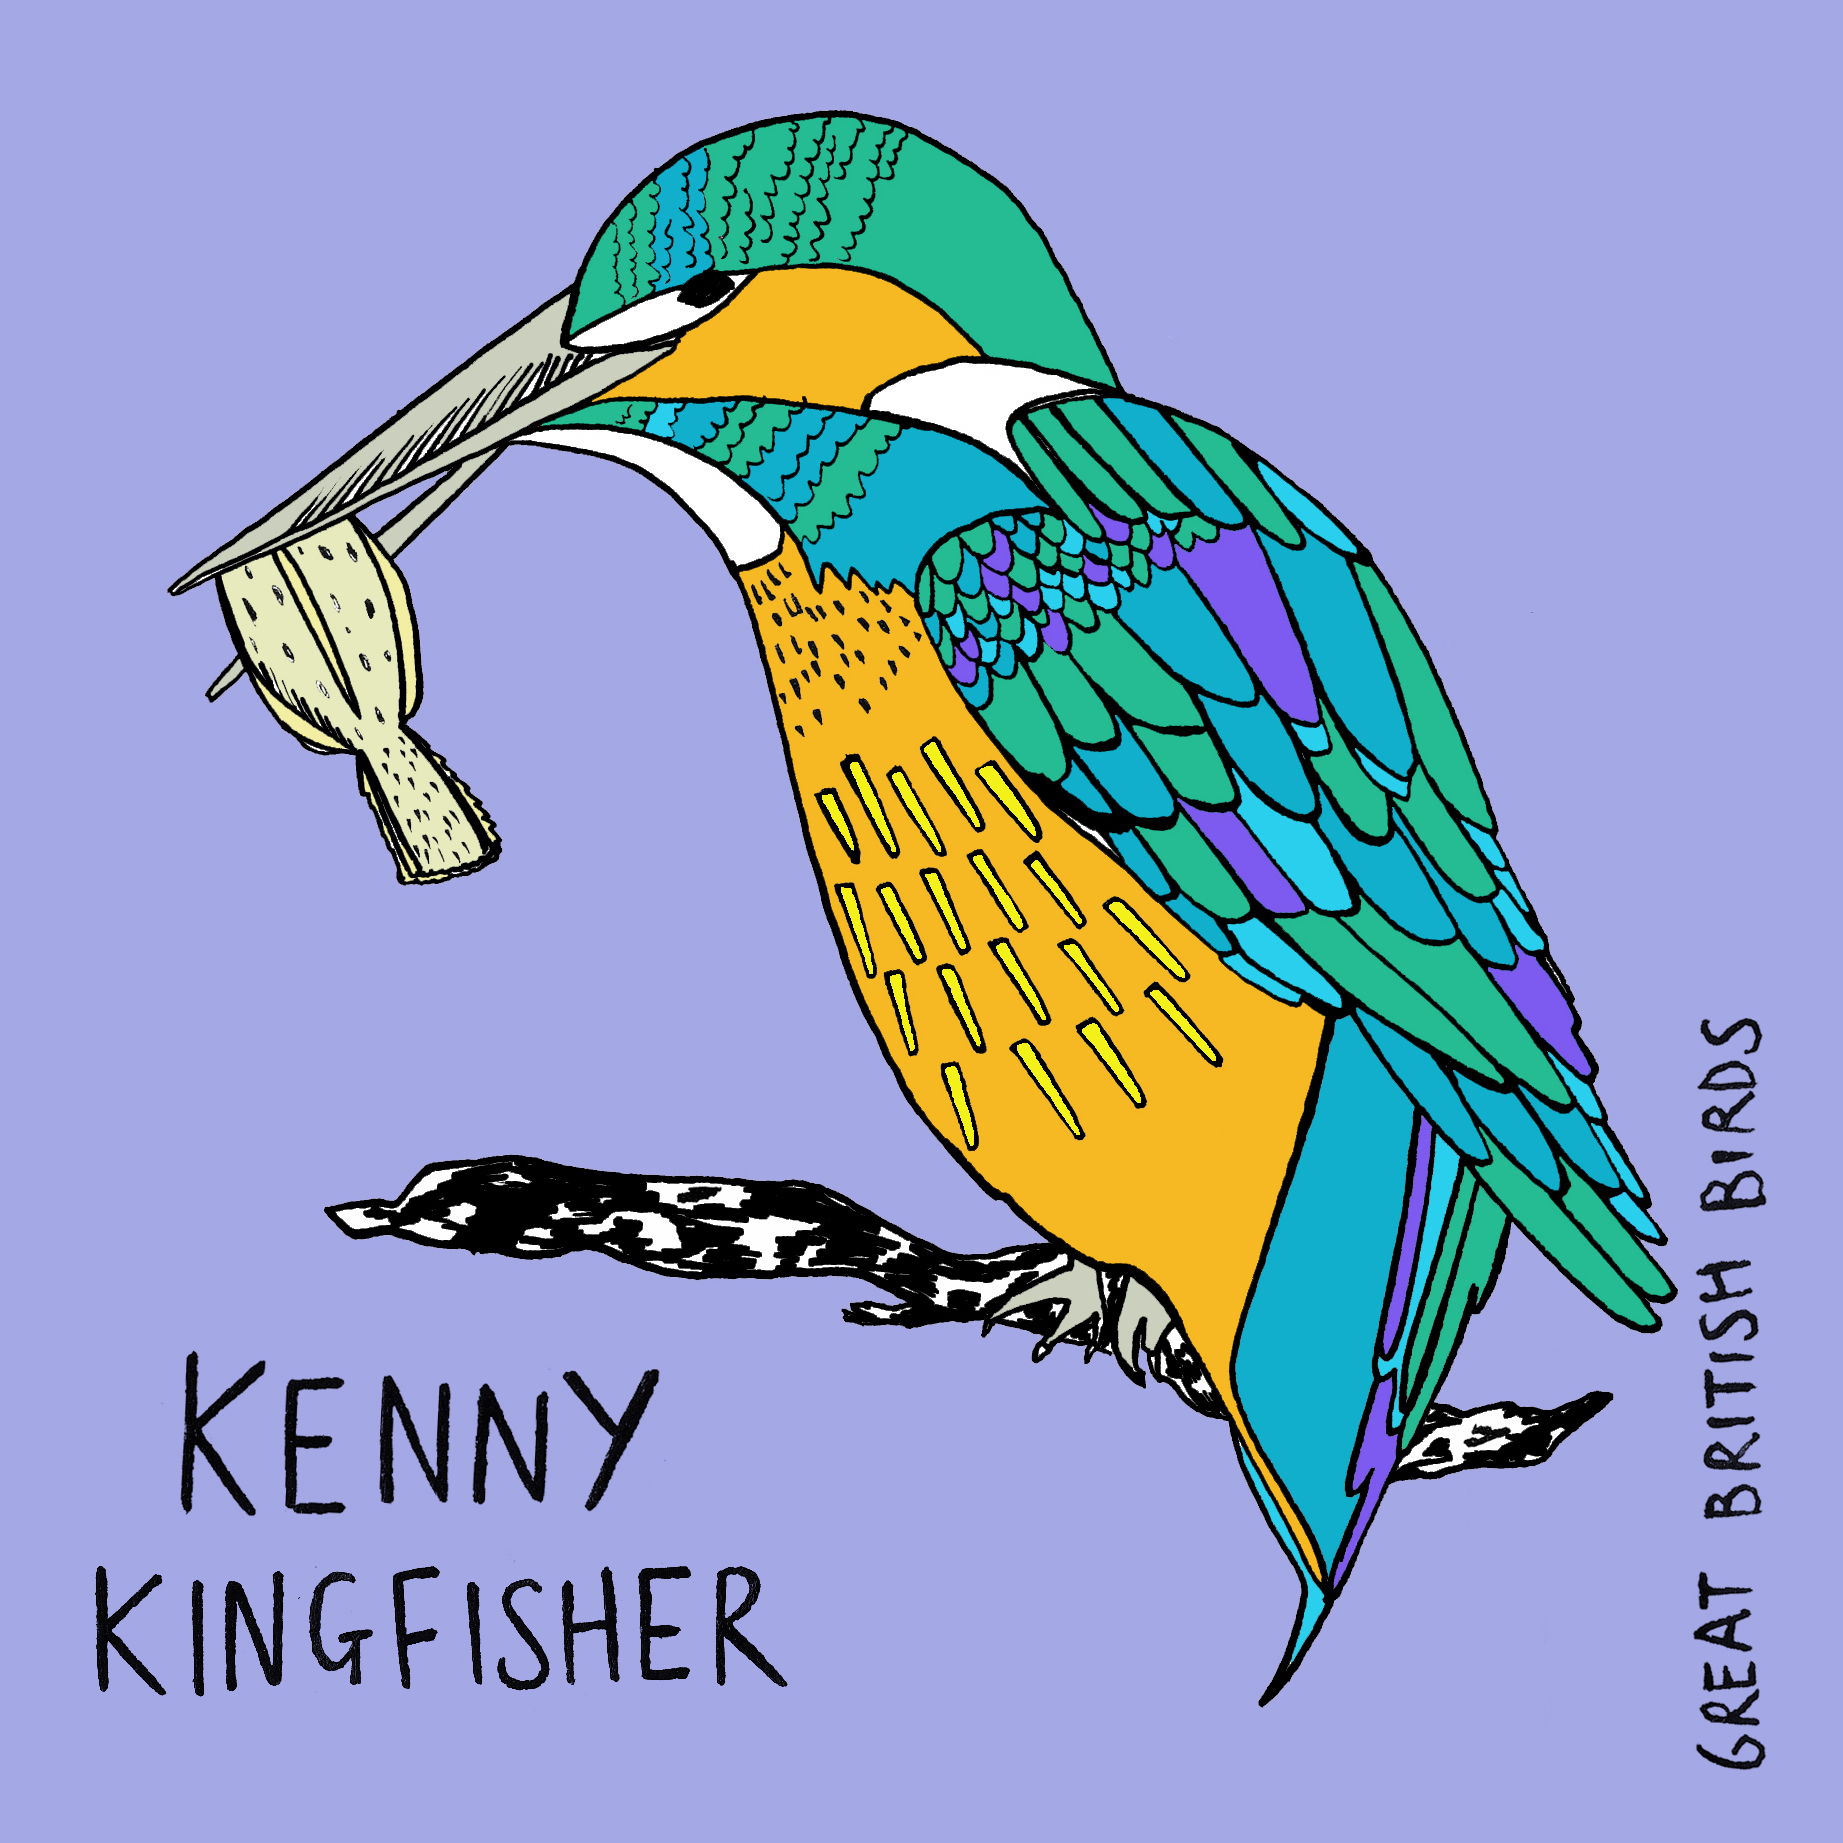 BIRDS_Kenny_Kingfisher_card.jpg